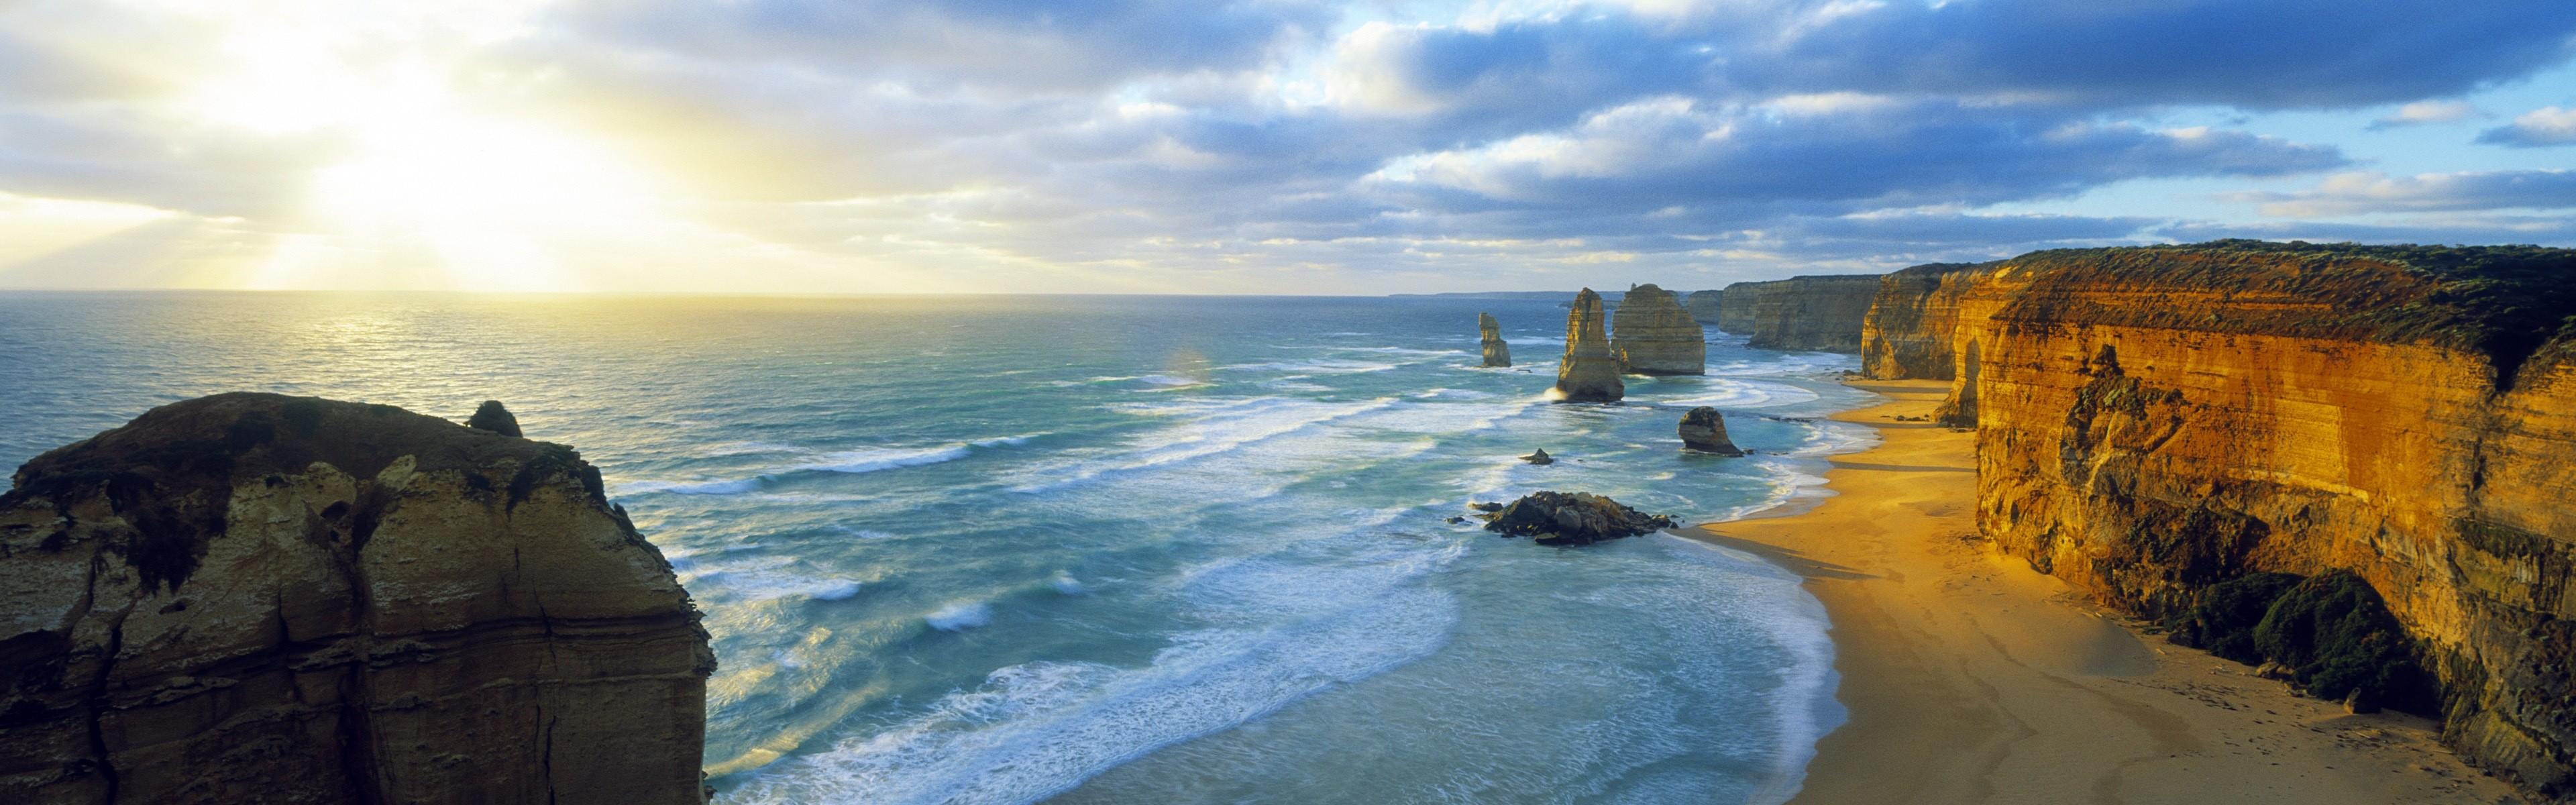 Beautiful beach sunset, Windows 8 panoramic widescreen wallpapers #2 –  3840×1200.